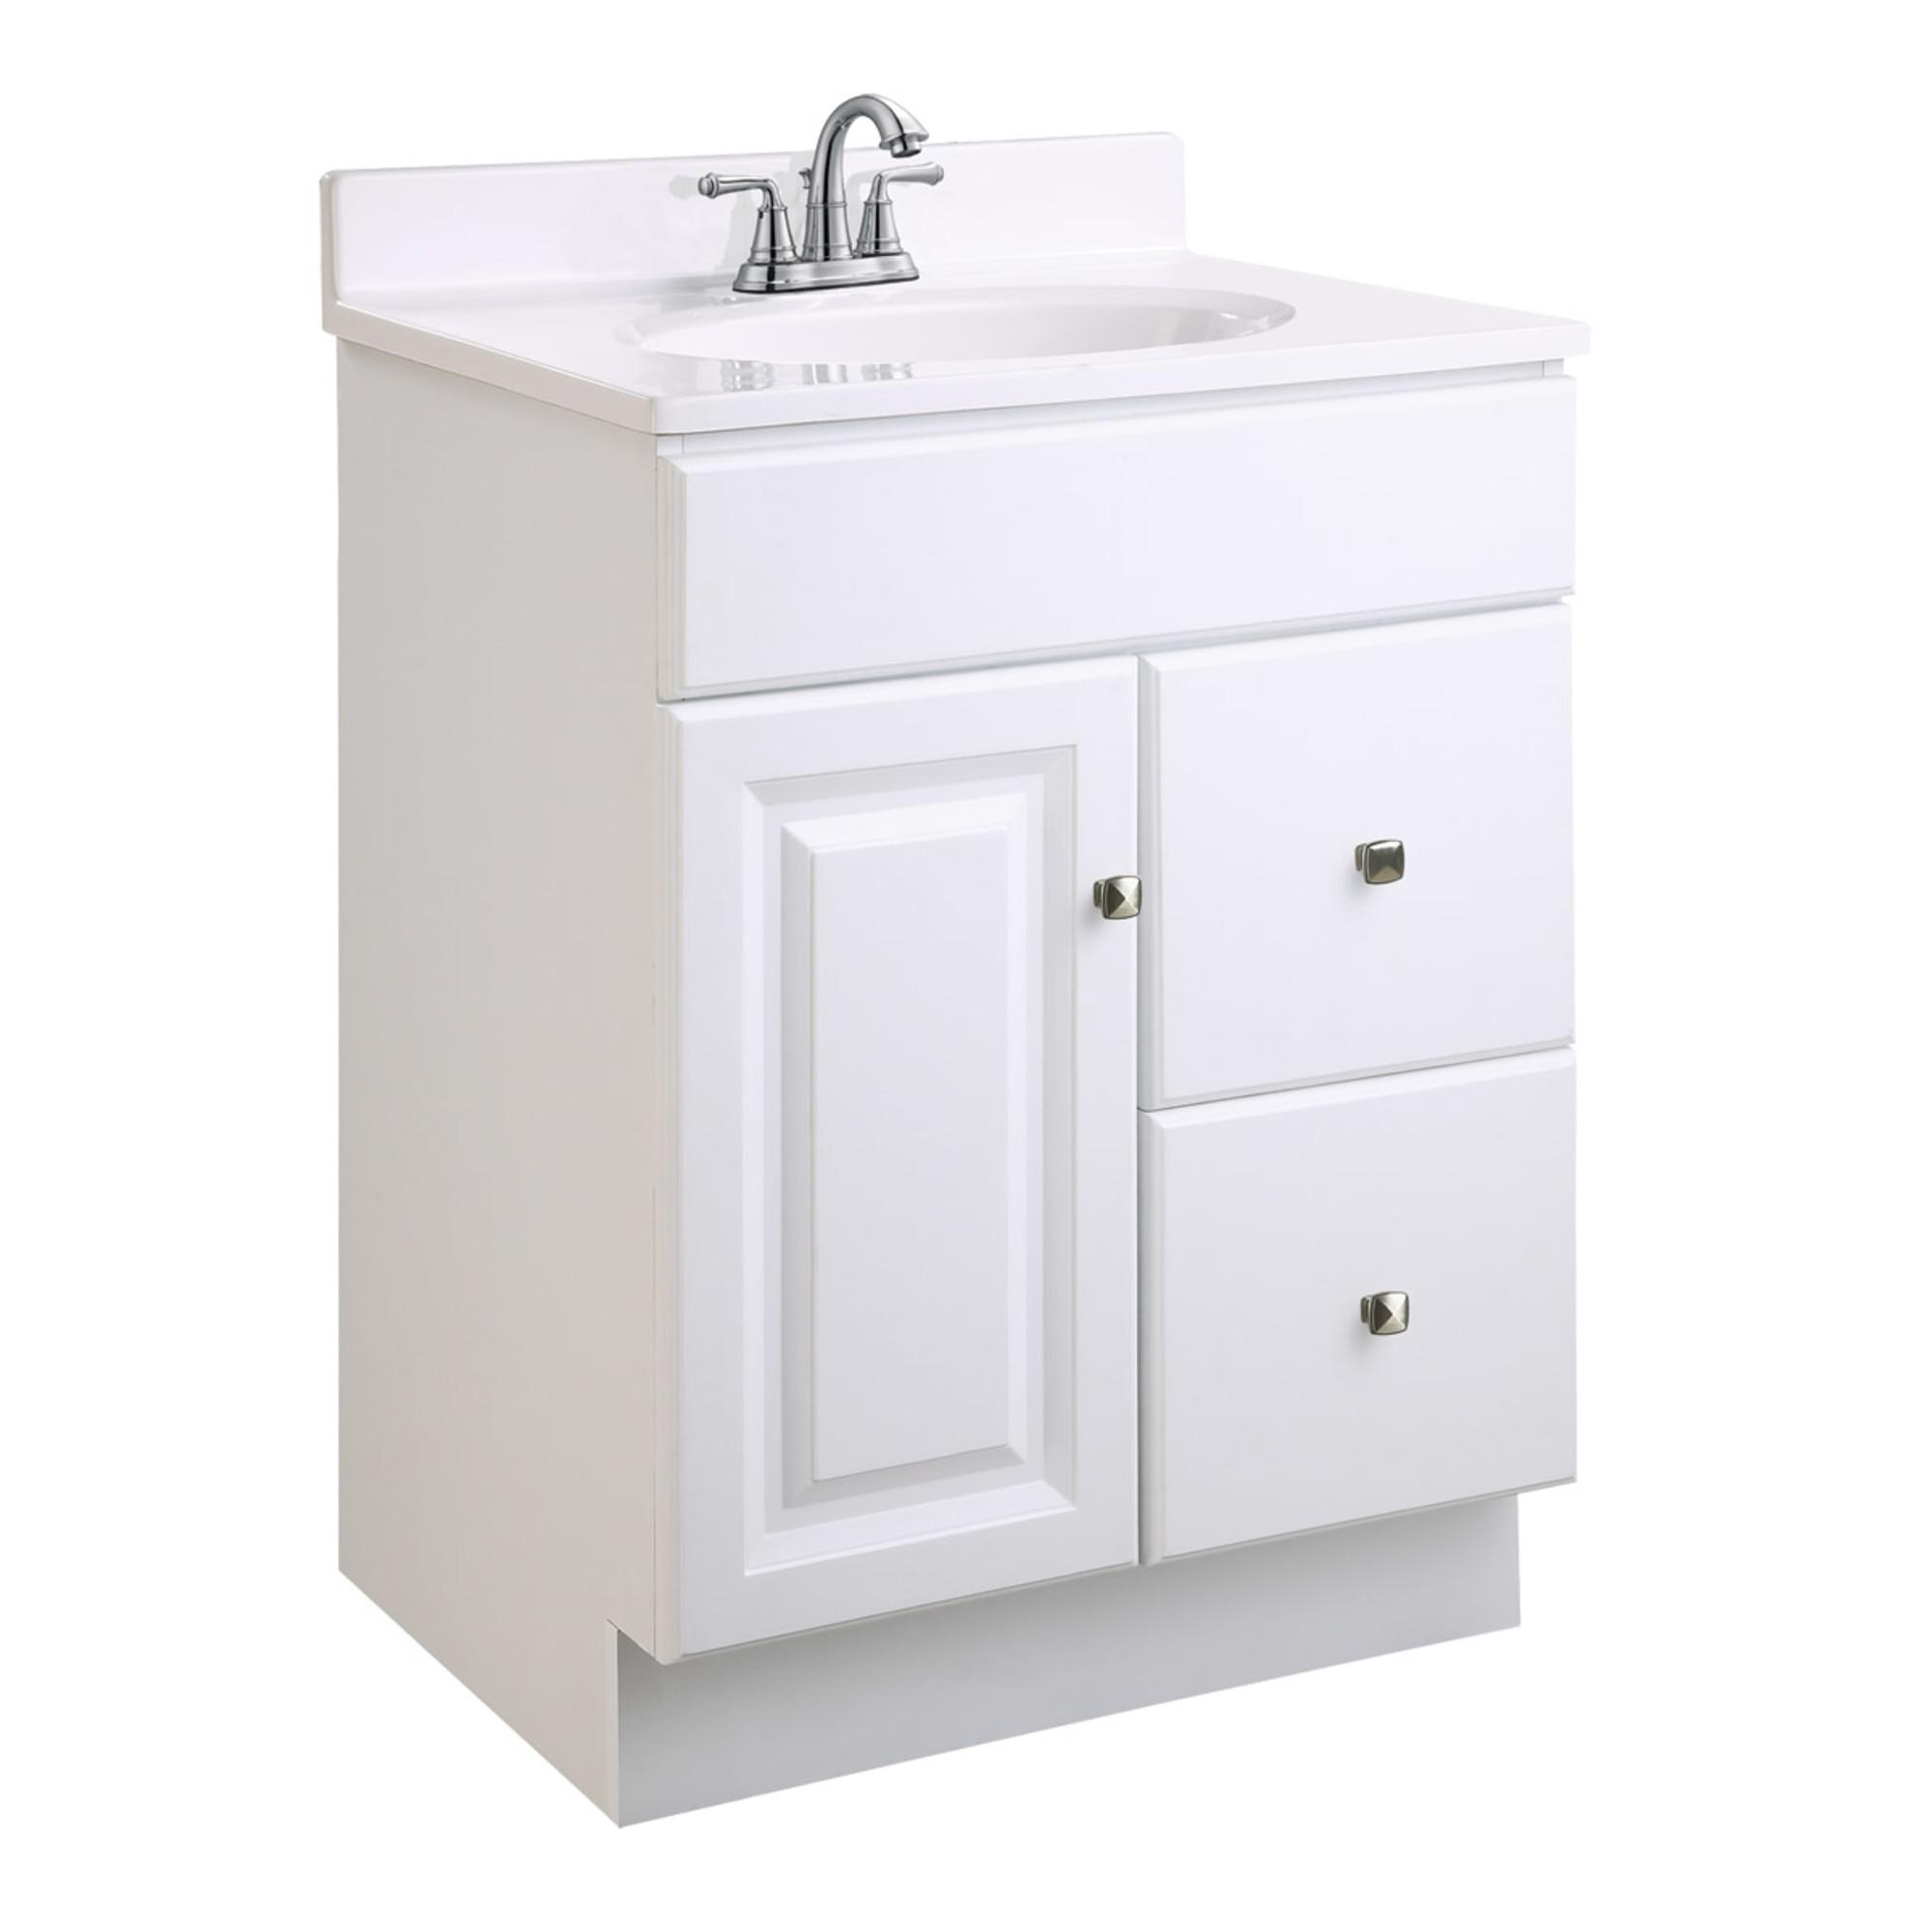 "Design House 545004 Wyndham Unassembled 1-Door 2-Drawer Vanity without Top, 24"", White"